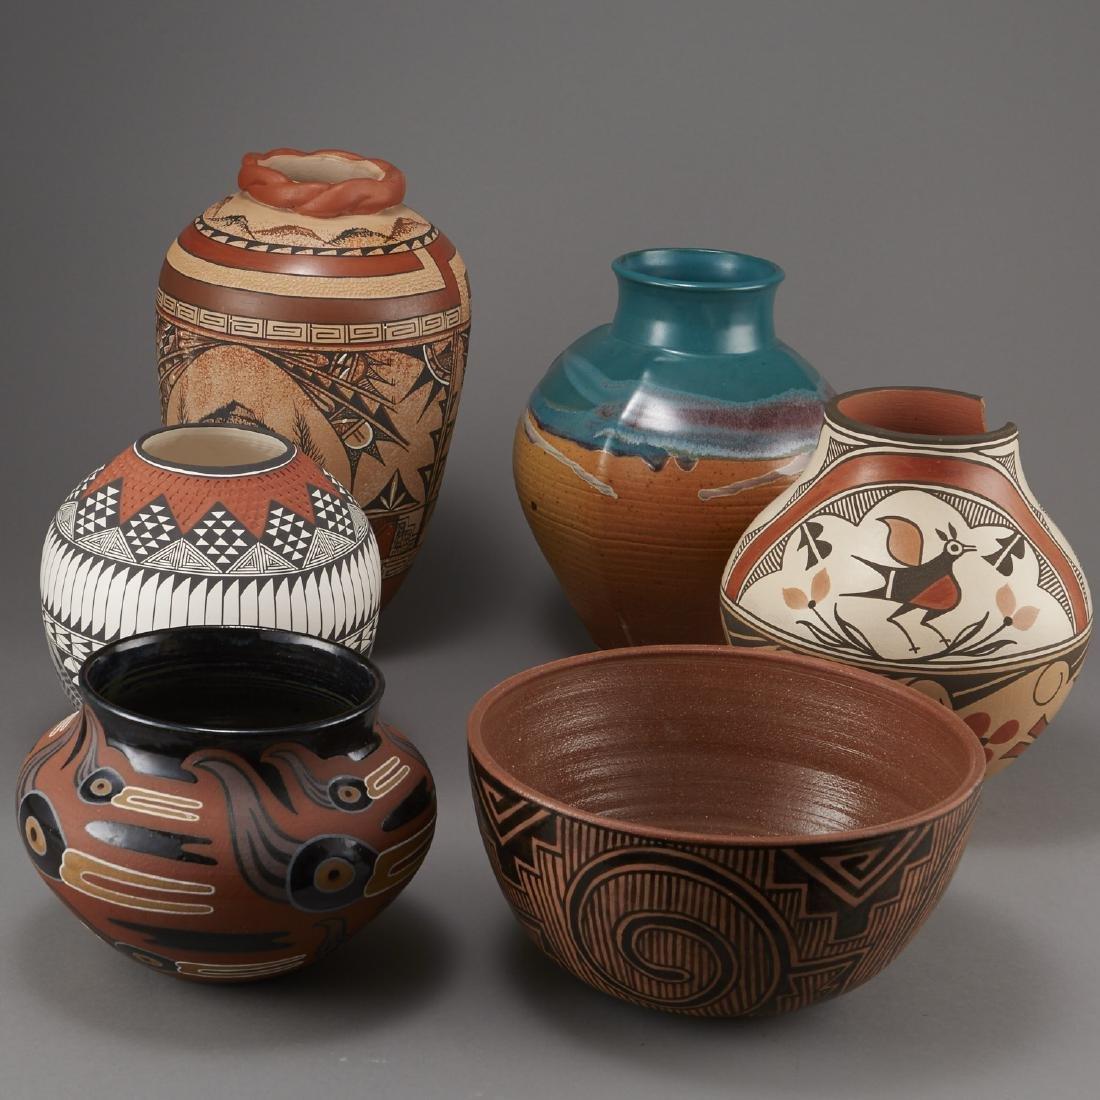 6 Pueblo Pottery Pots incld Fragua, Nez, Medina